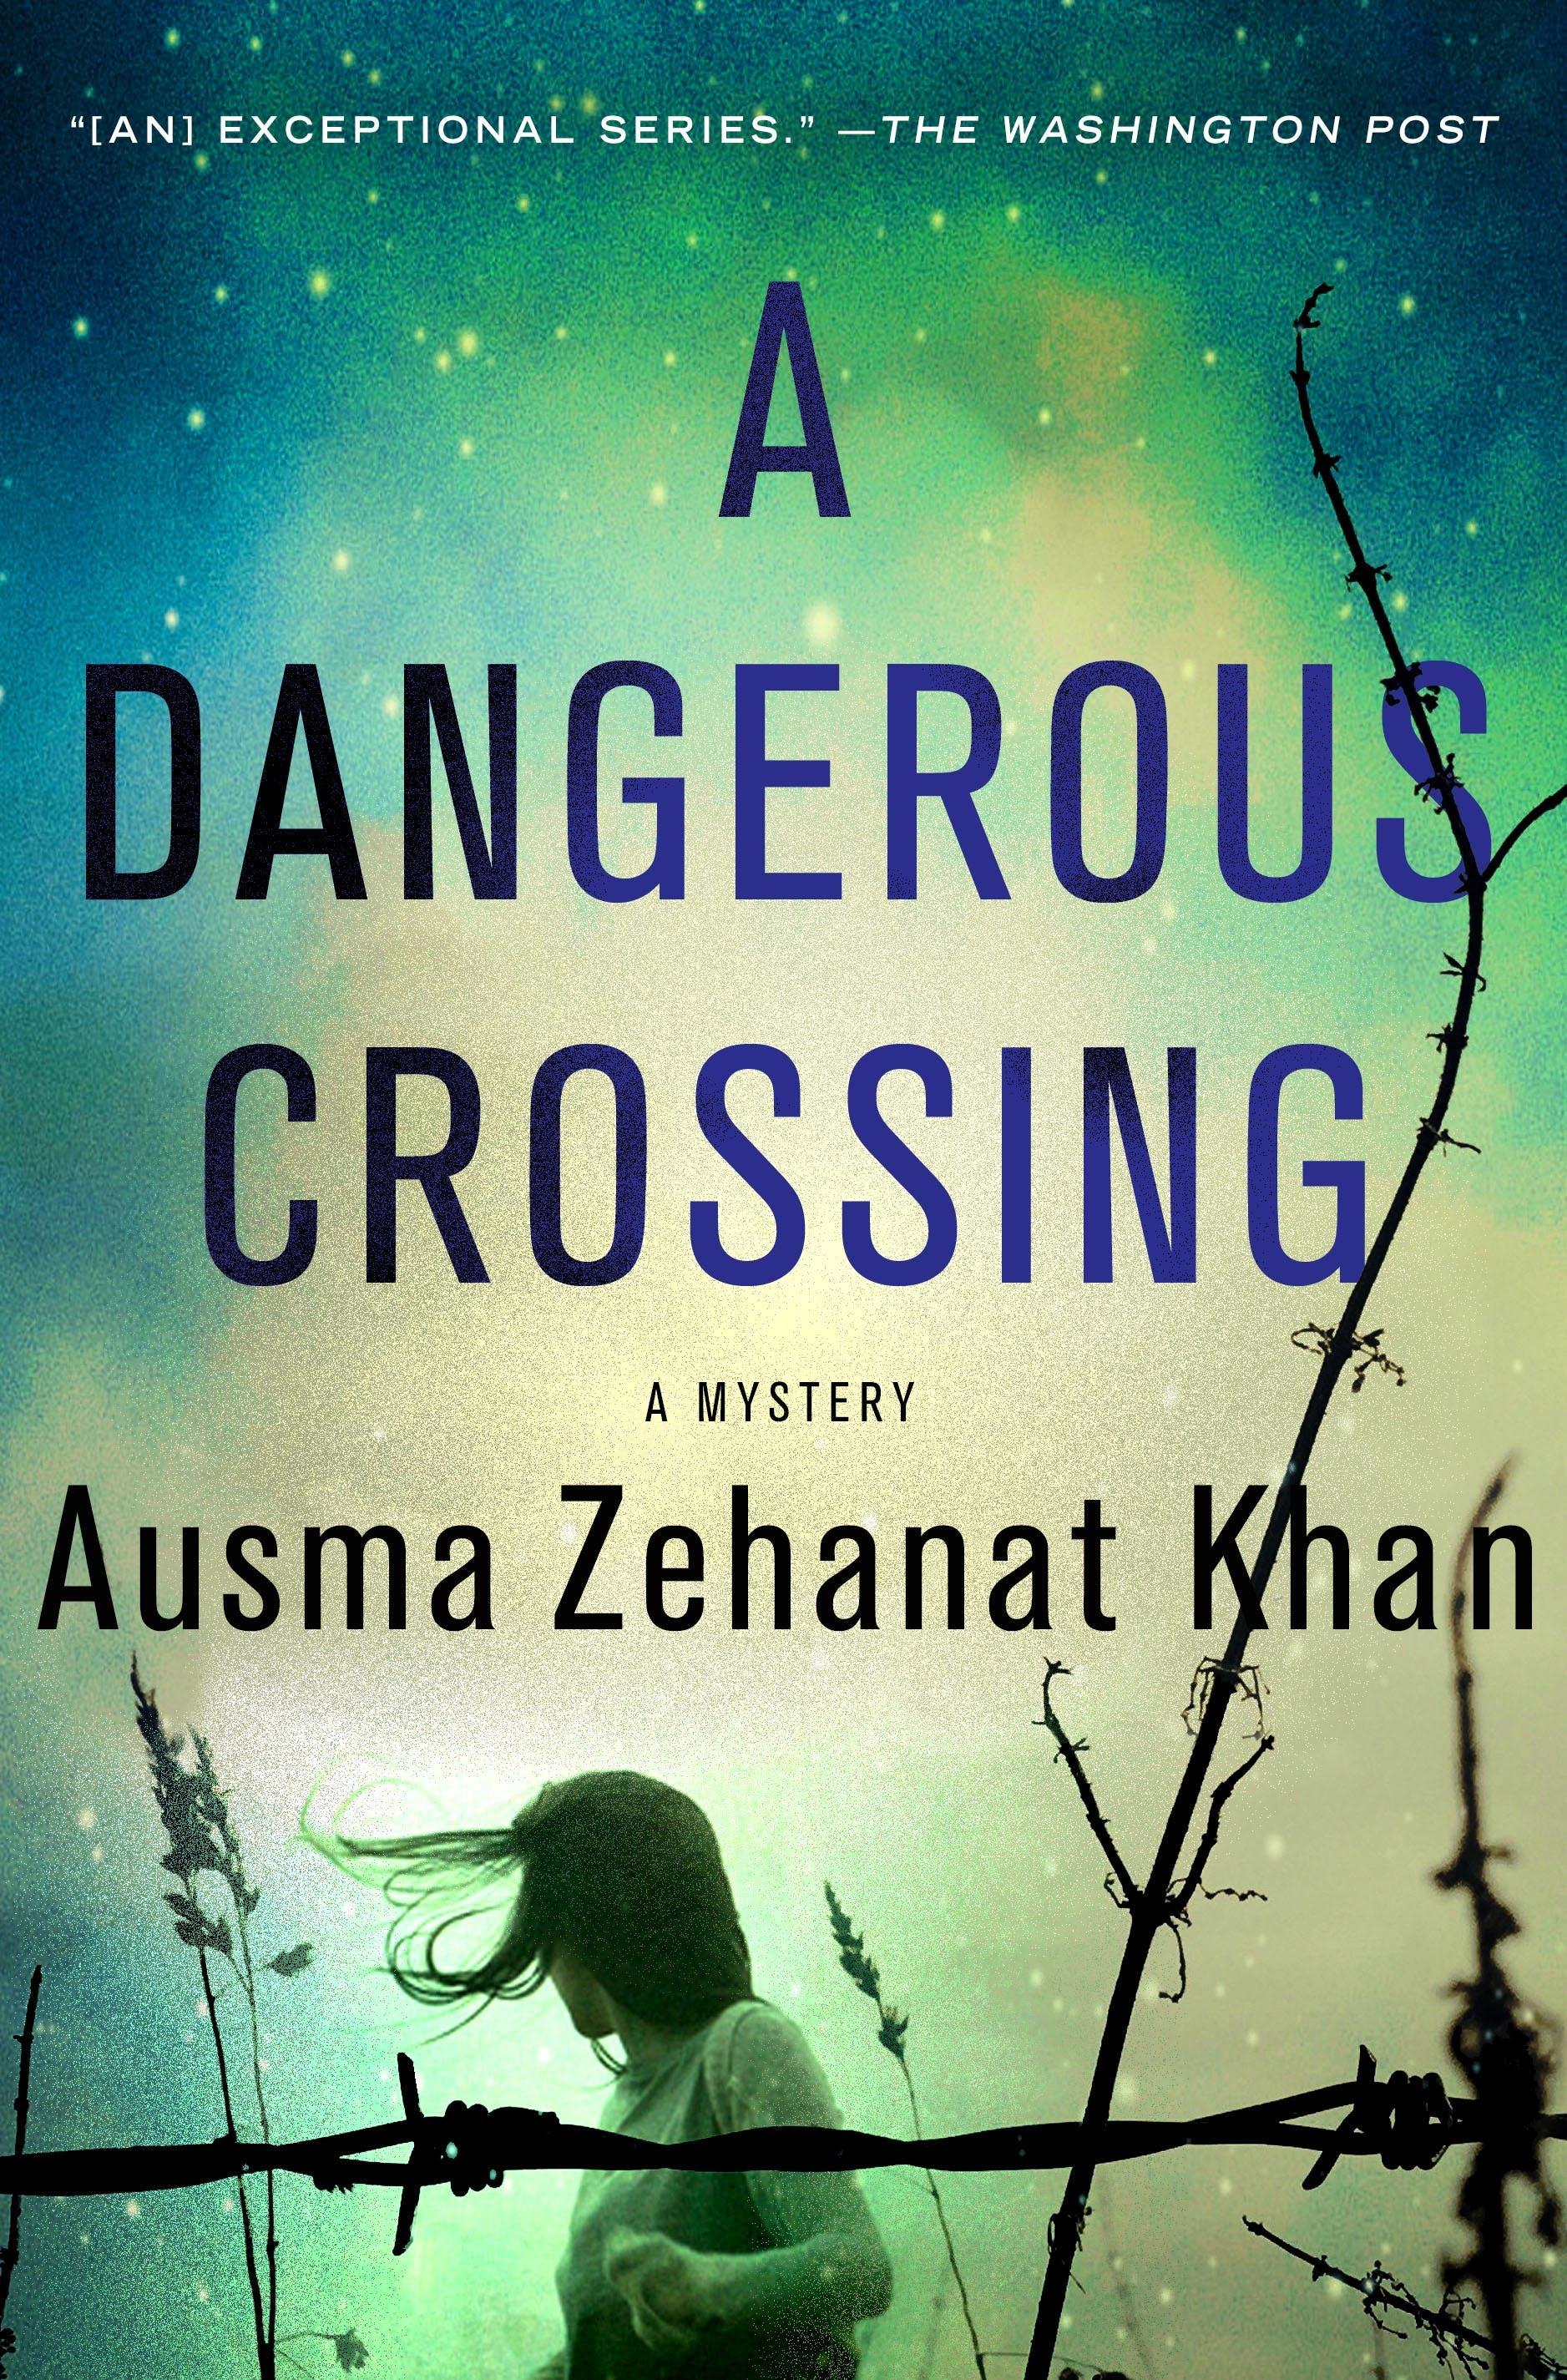 Image of A Dangerous Crossing